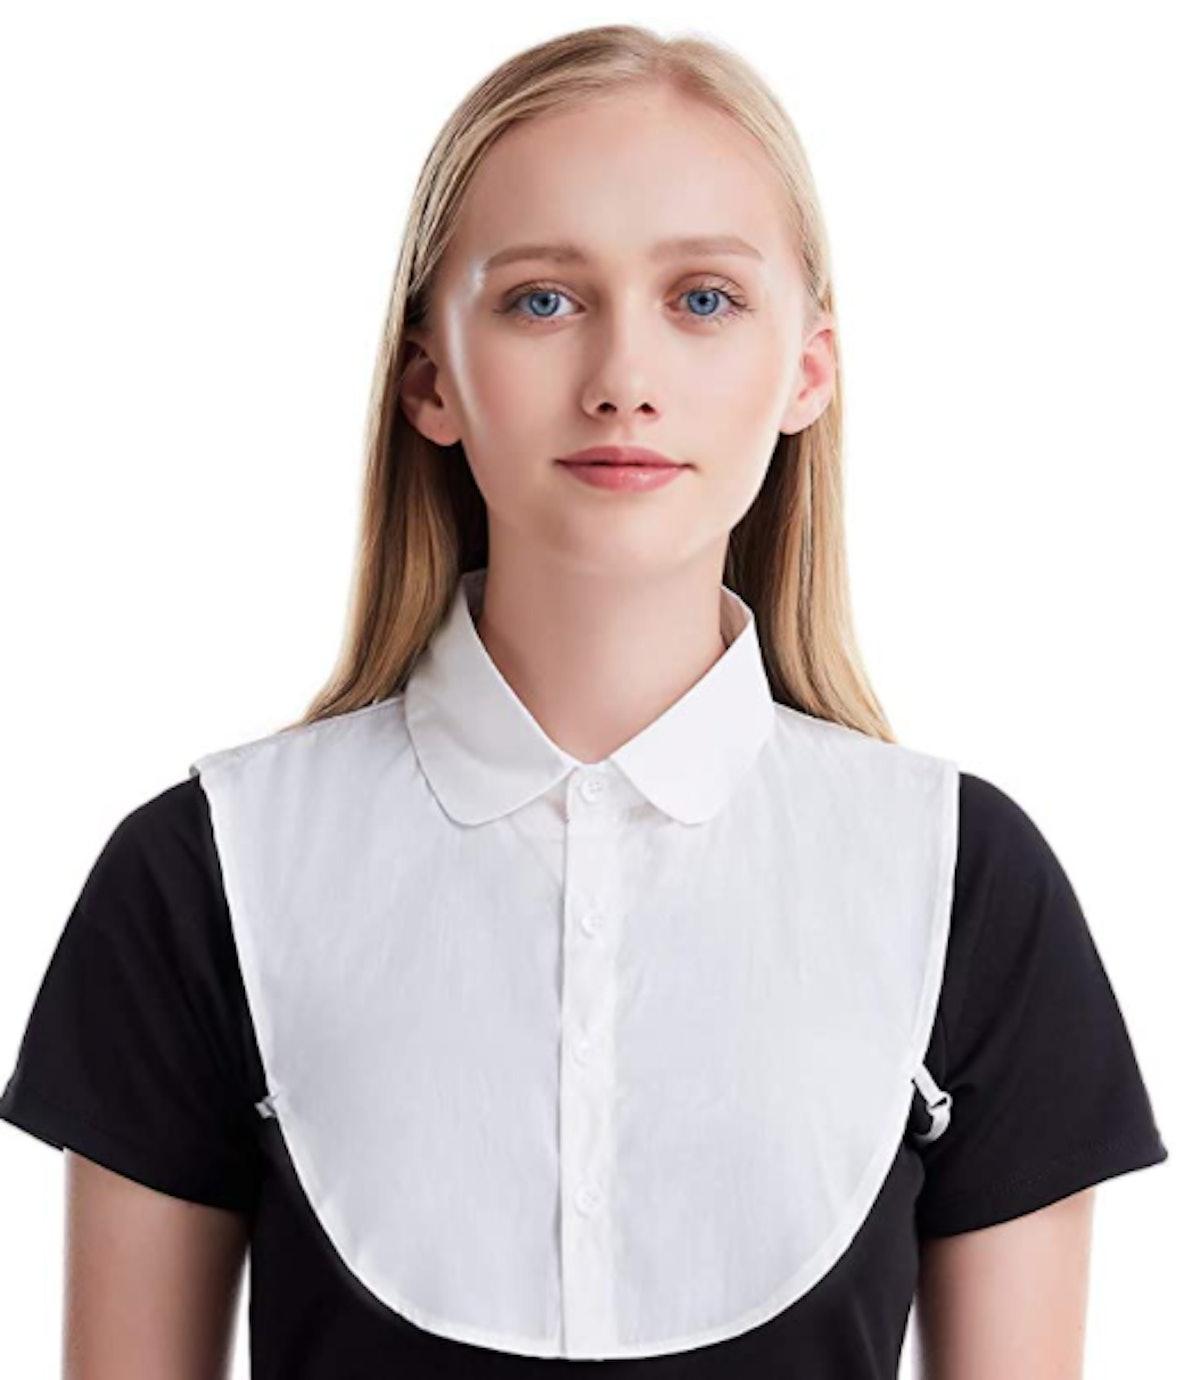 Shinywear Detachable Dickey Collar